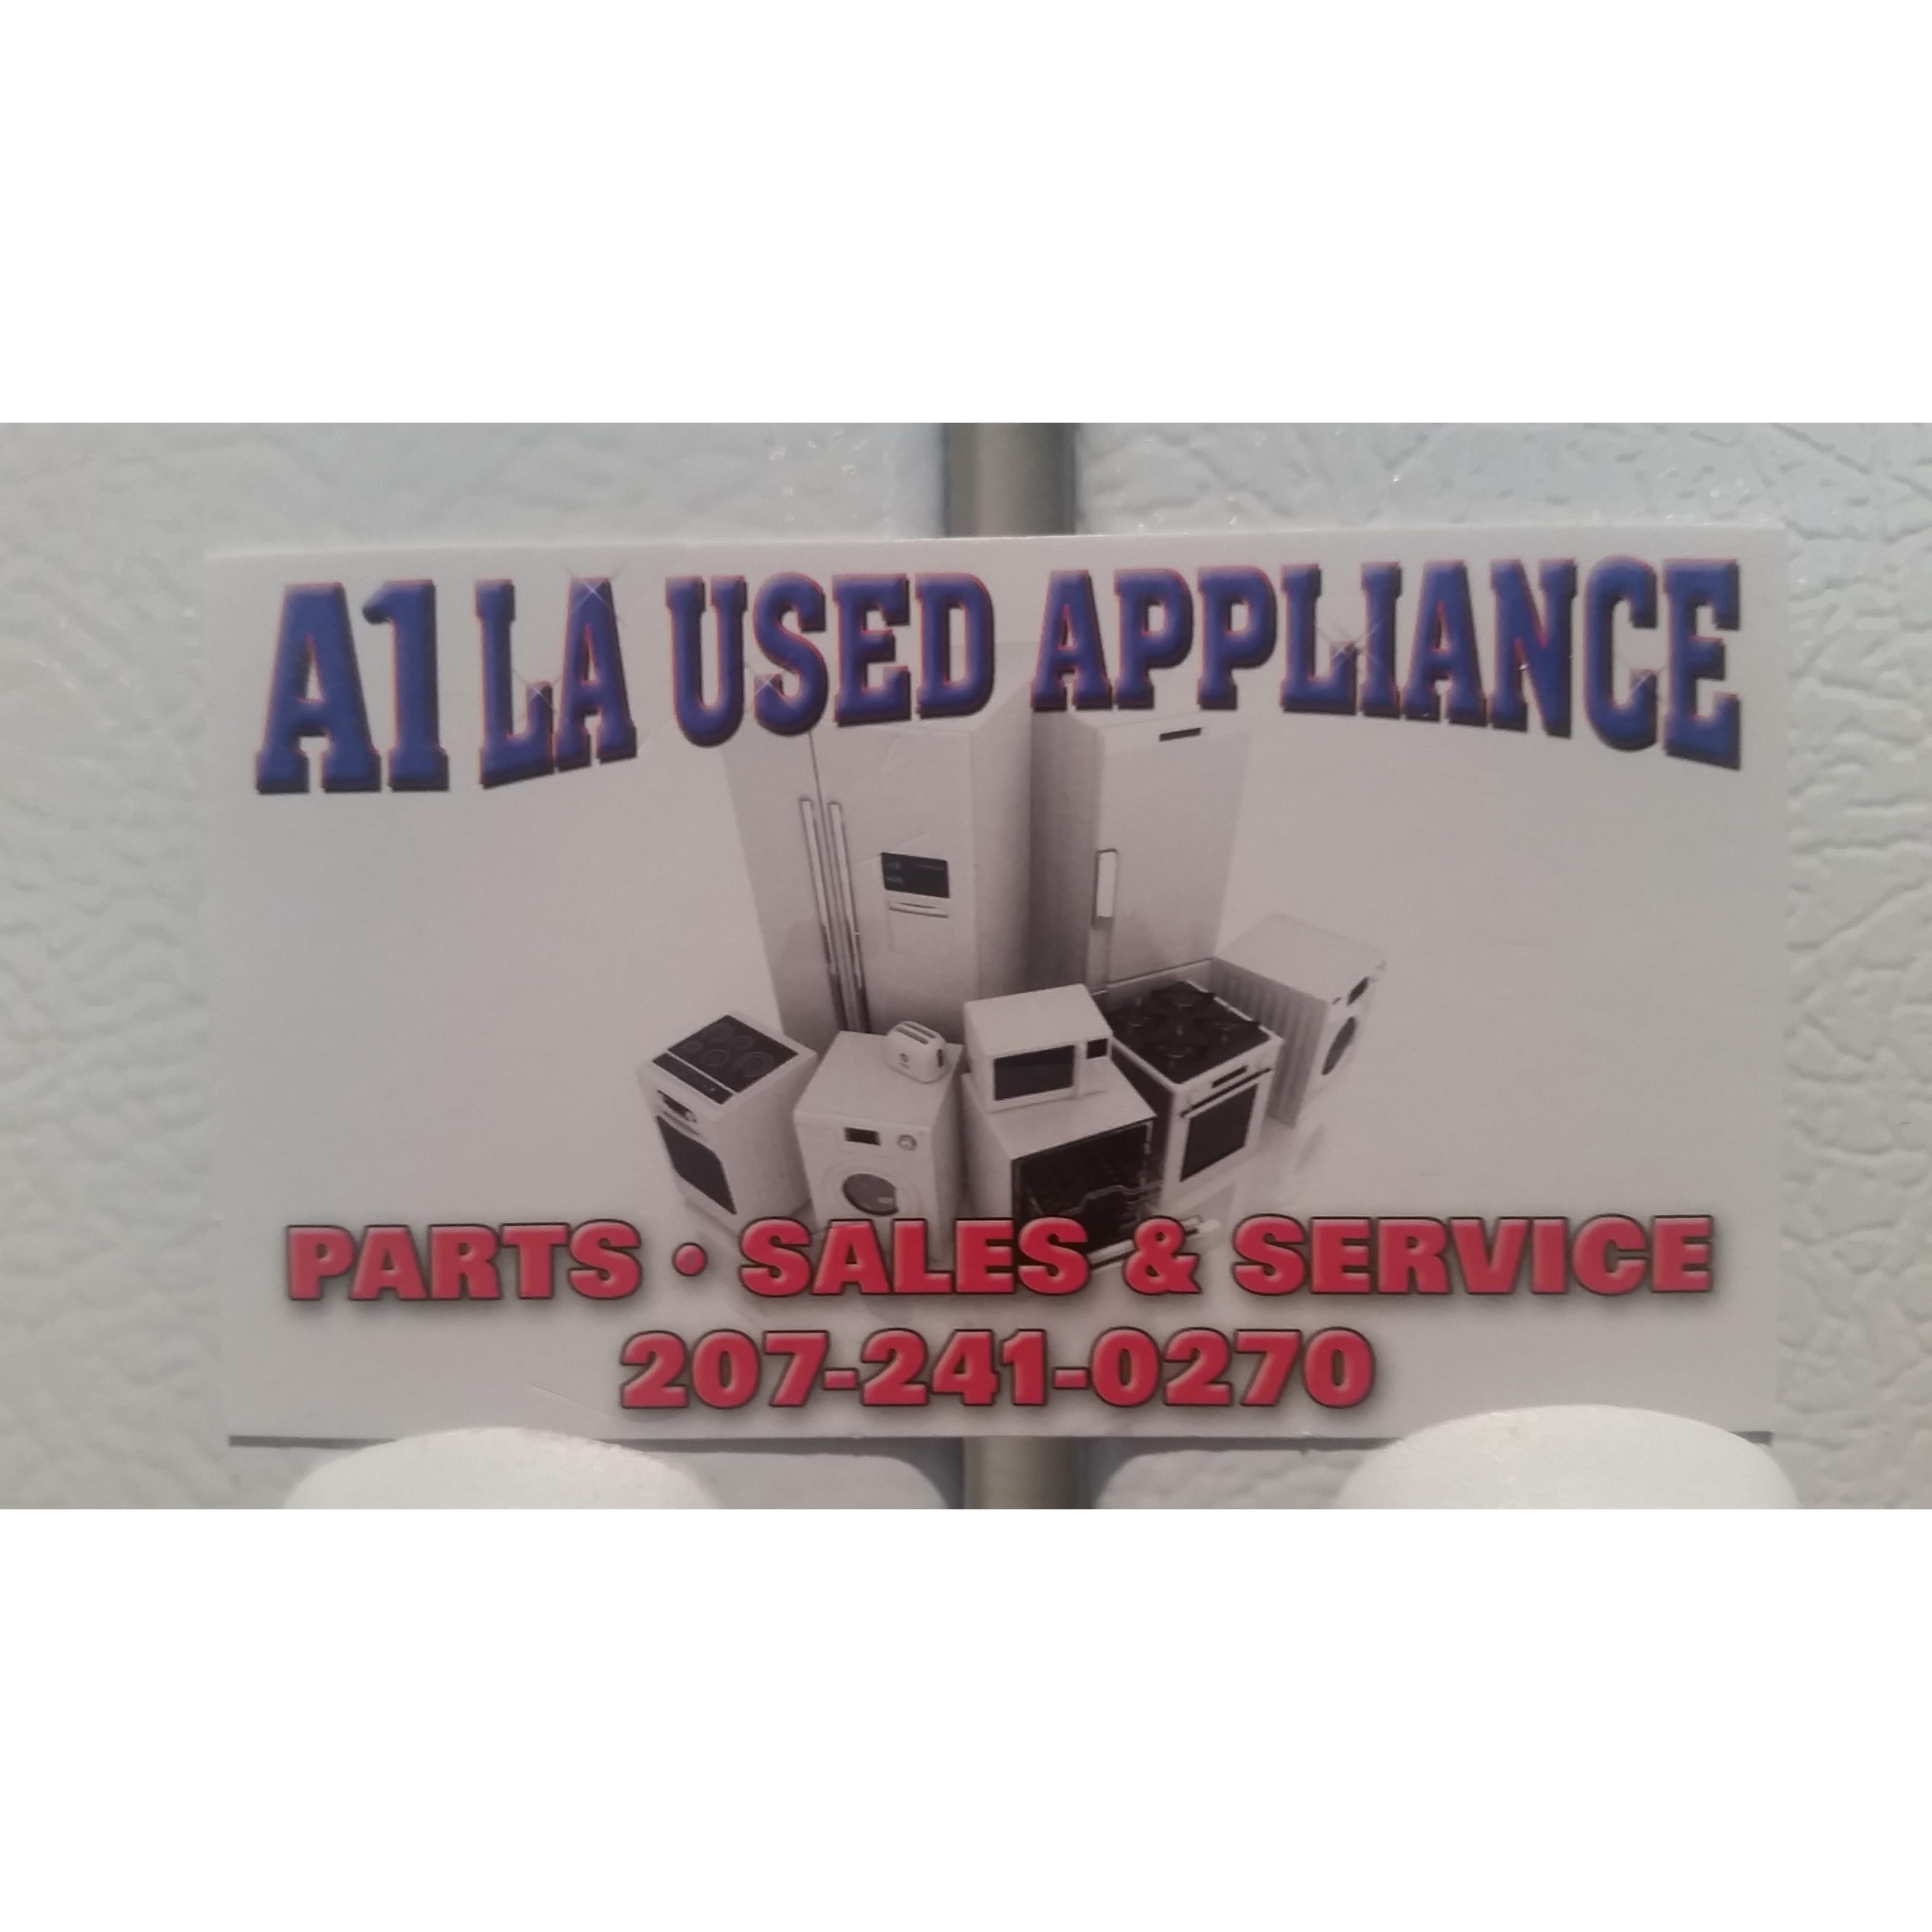 Appliance Repair Auburn Broken Ipad Screen Replacement